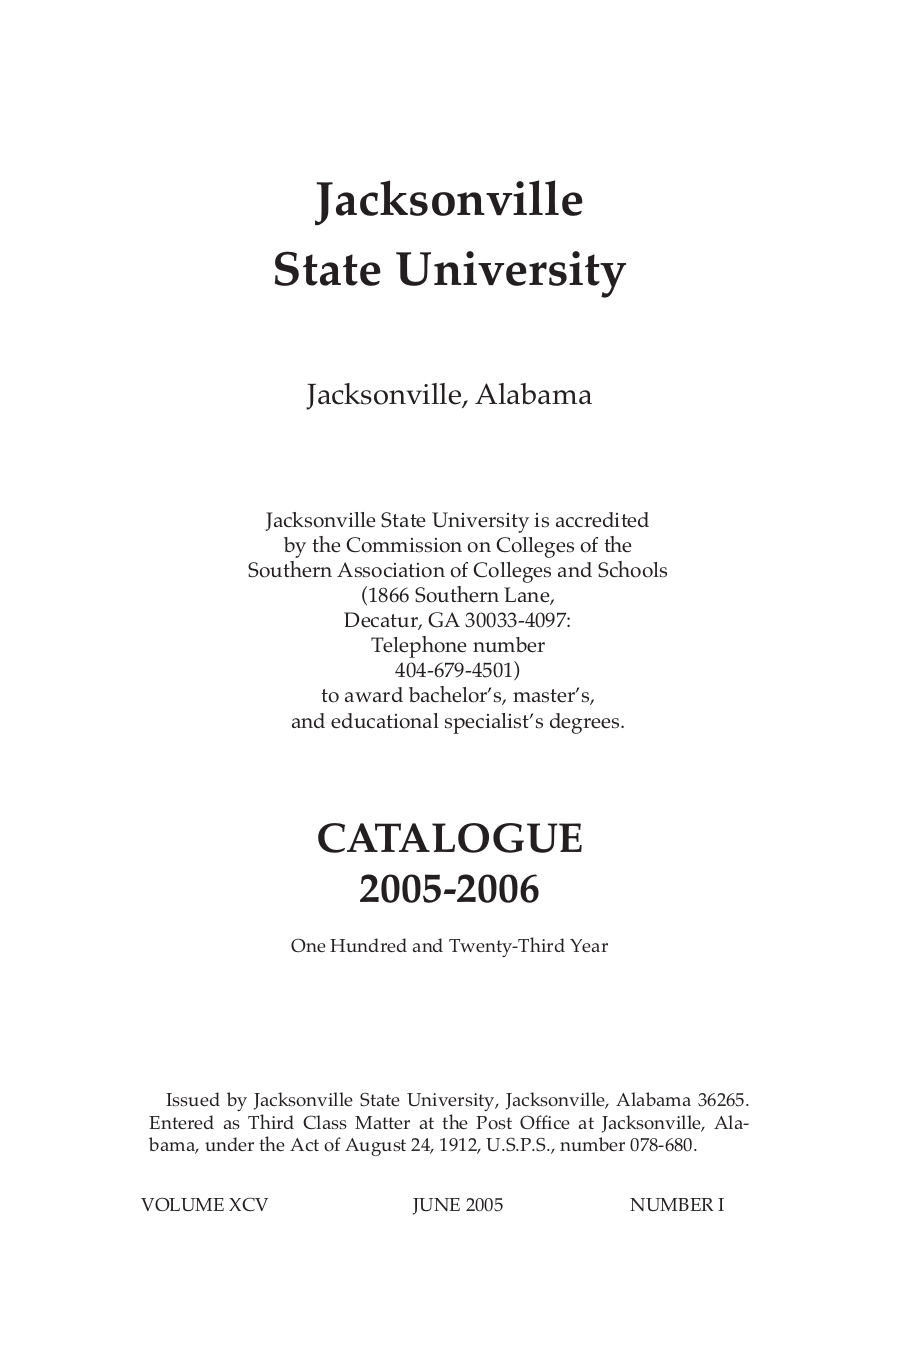 jsu thesis guide